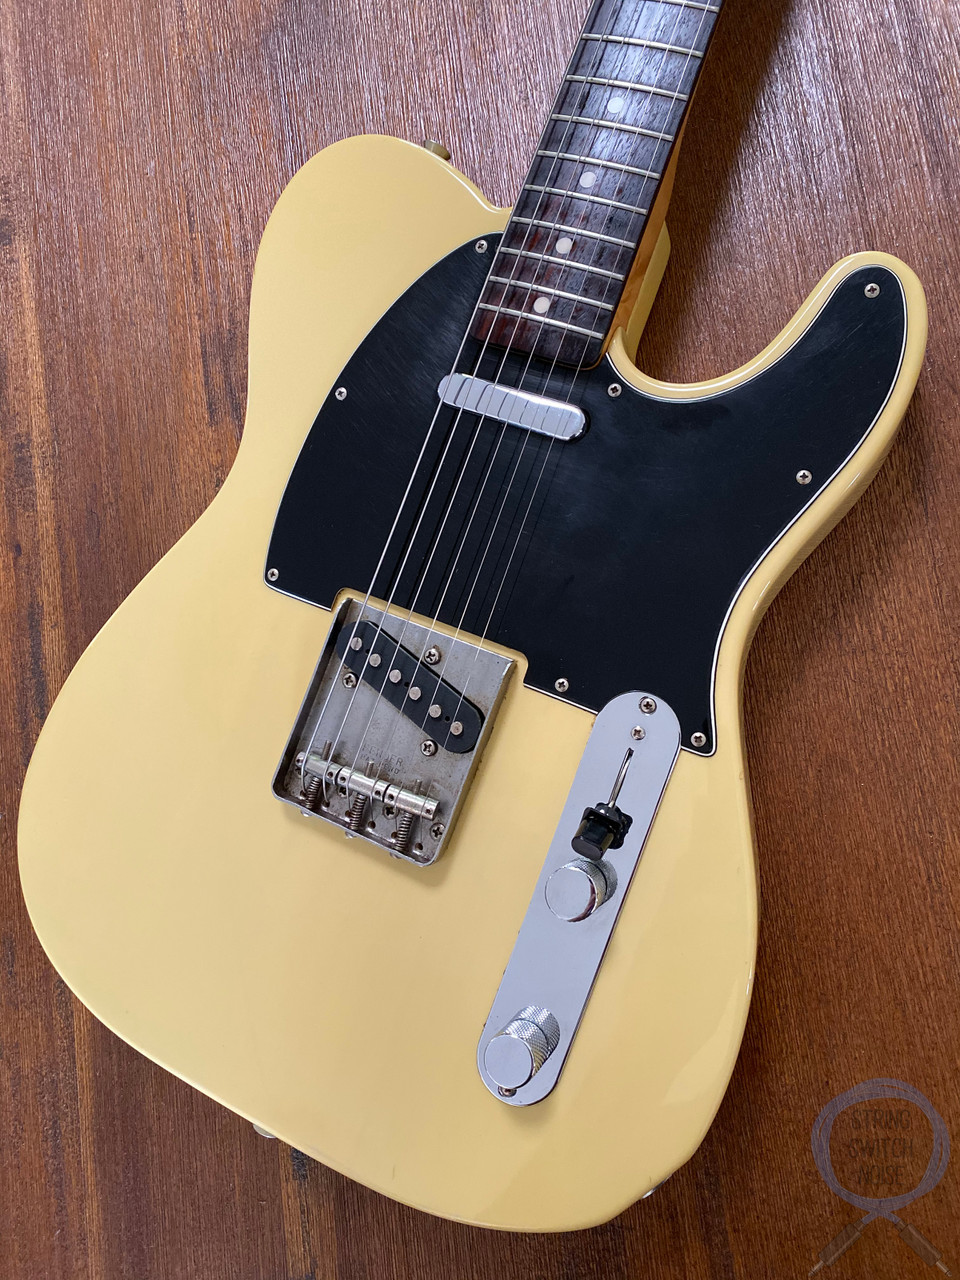 Fender Telecaster, '72, Blonde and Black Guard, 1997